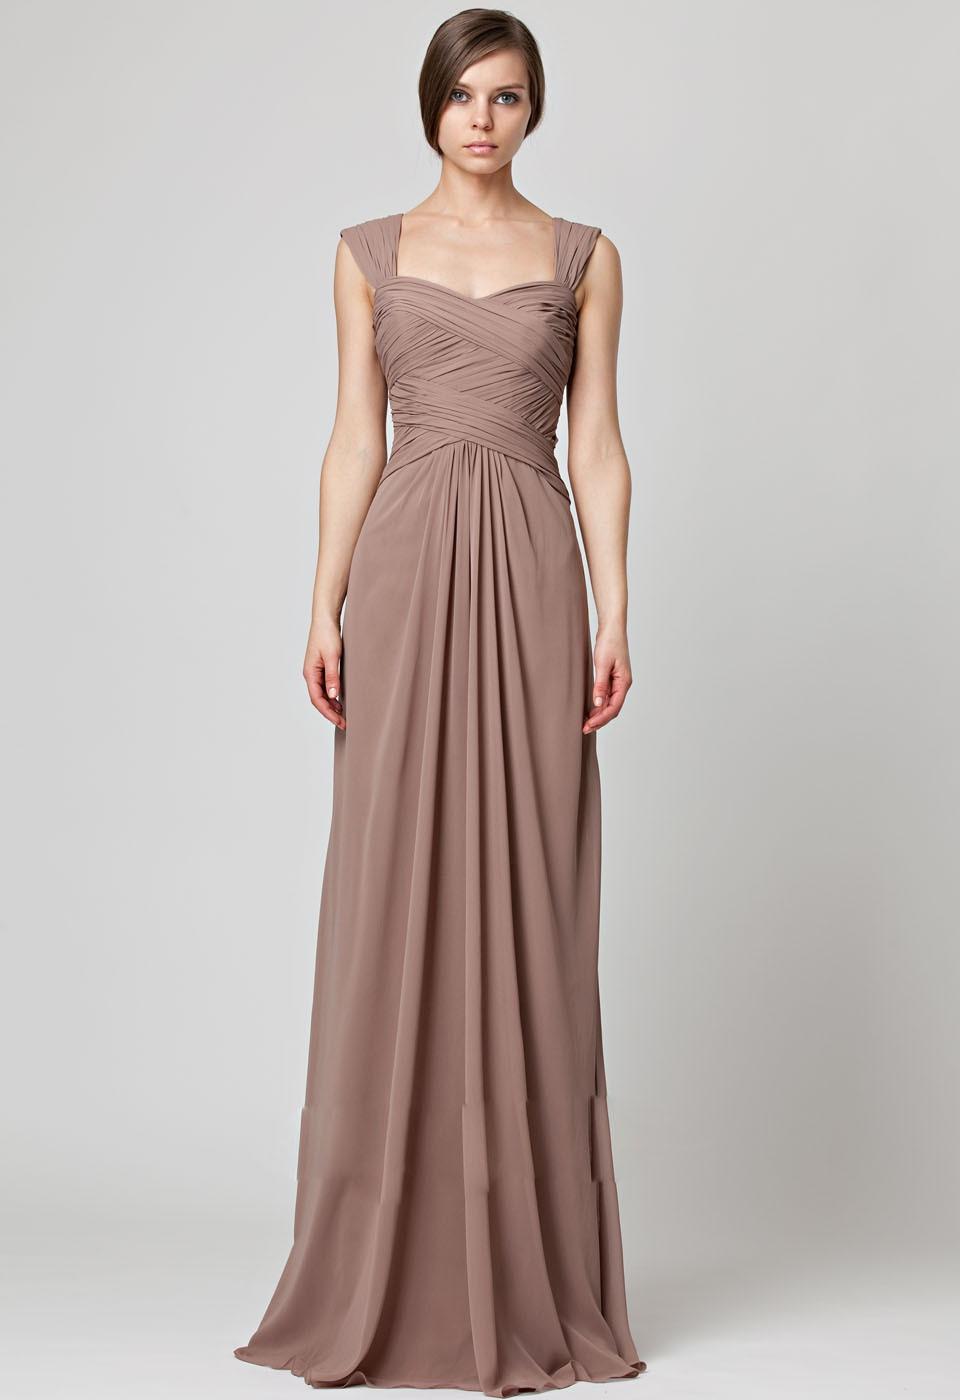 Chiffon Cap Sleeves Sheath Ruched Empire Waist Long Bridesmaids Dress 450036